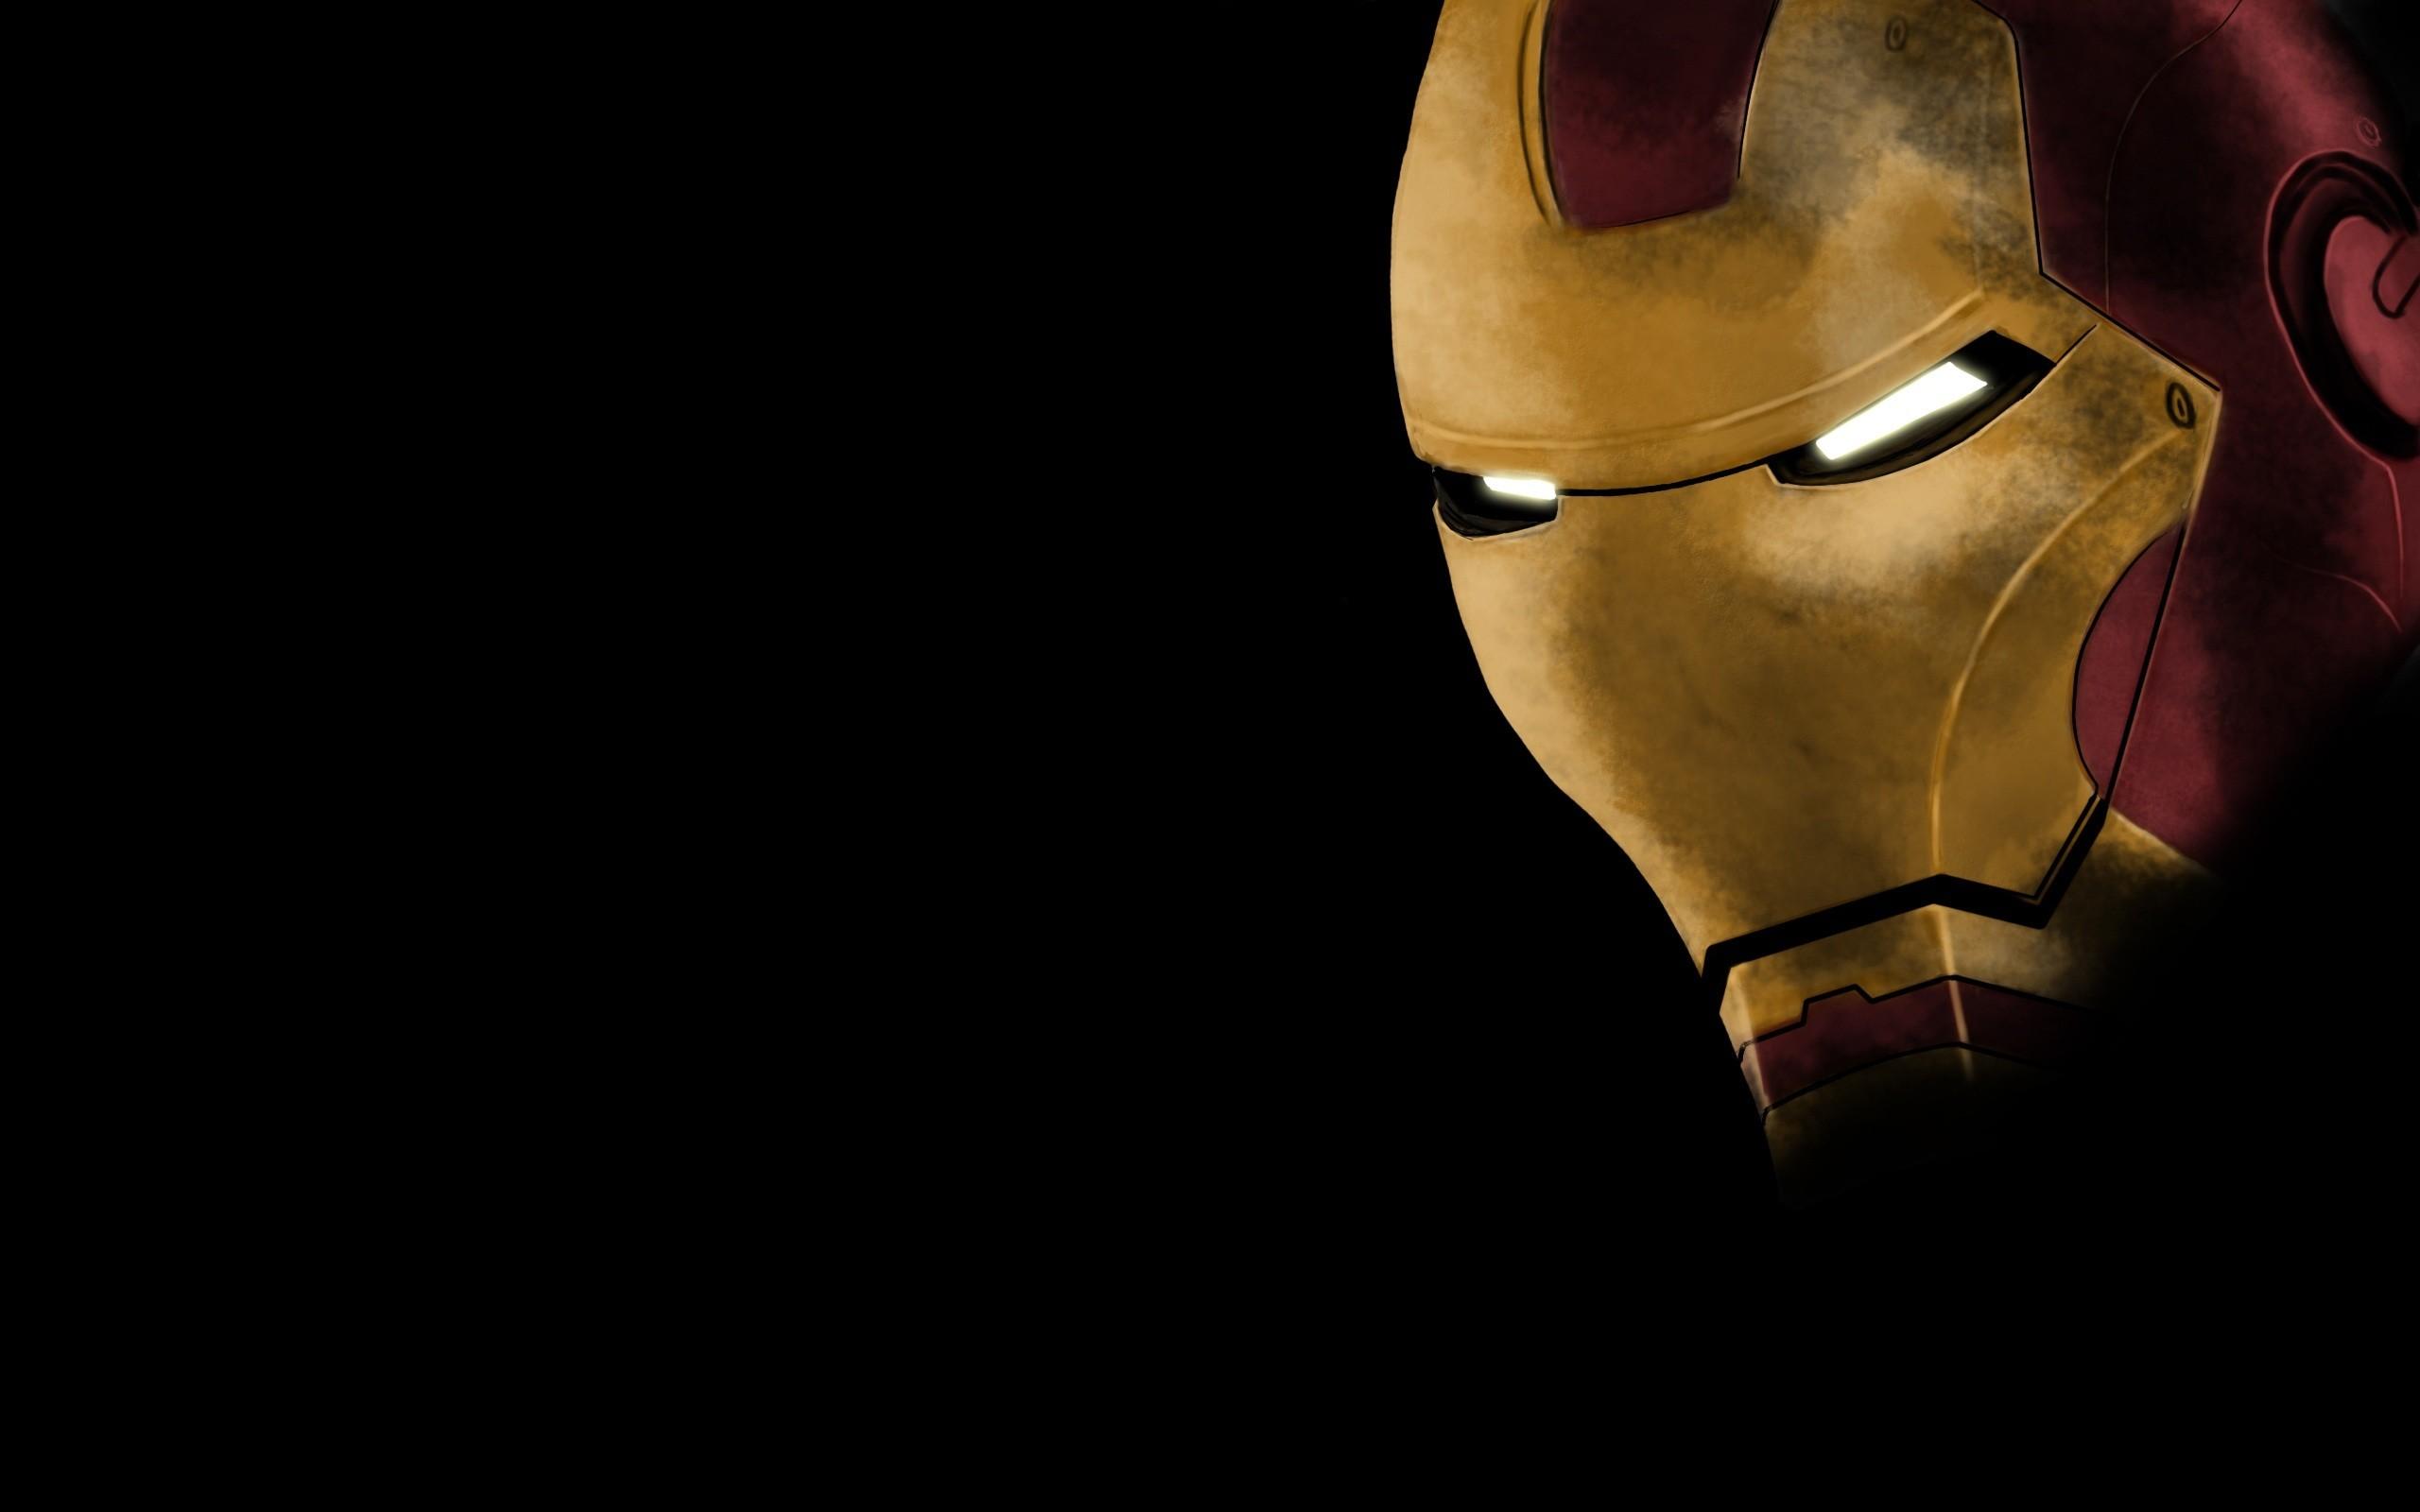 Iron Man Wallpapers Iphone movie Wallpaper